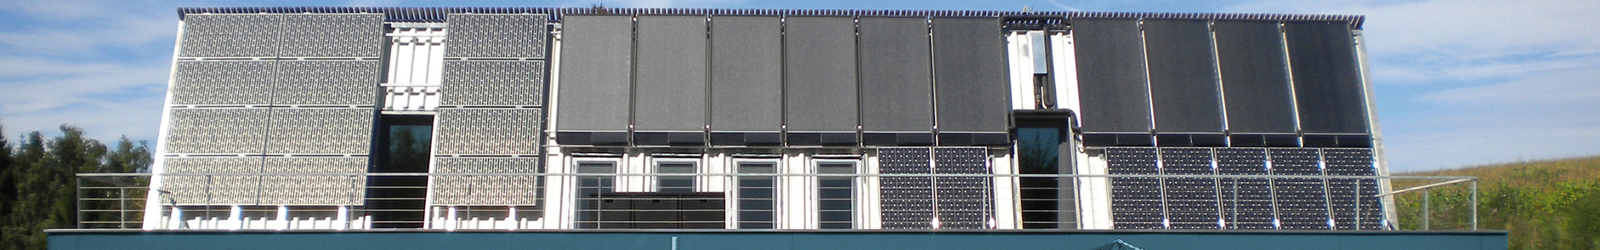 Caviezel Heiztechnik AG Solaranlagen